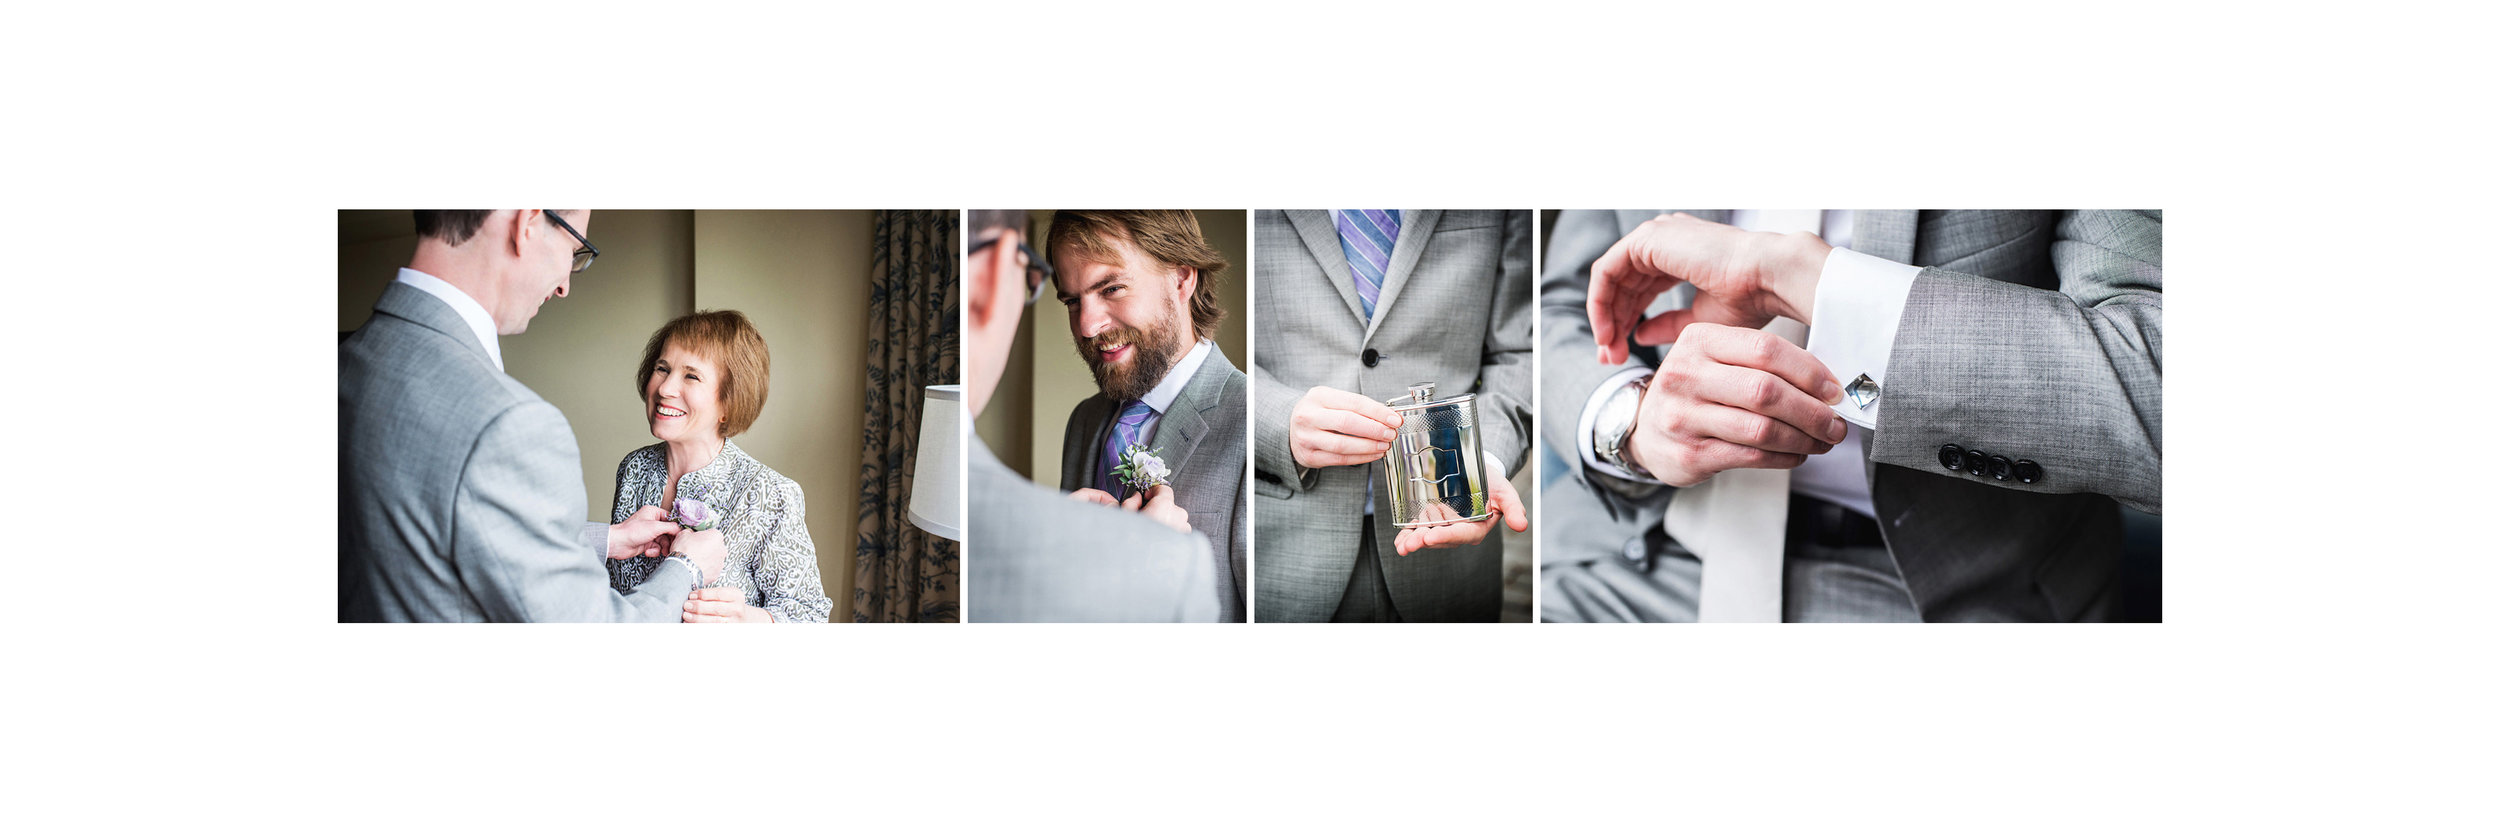 Andrea-Reuben-Grouse-Mountain-Wedding-Real-Weddings-Feature-Yaletown-Photography-005.jpg